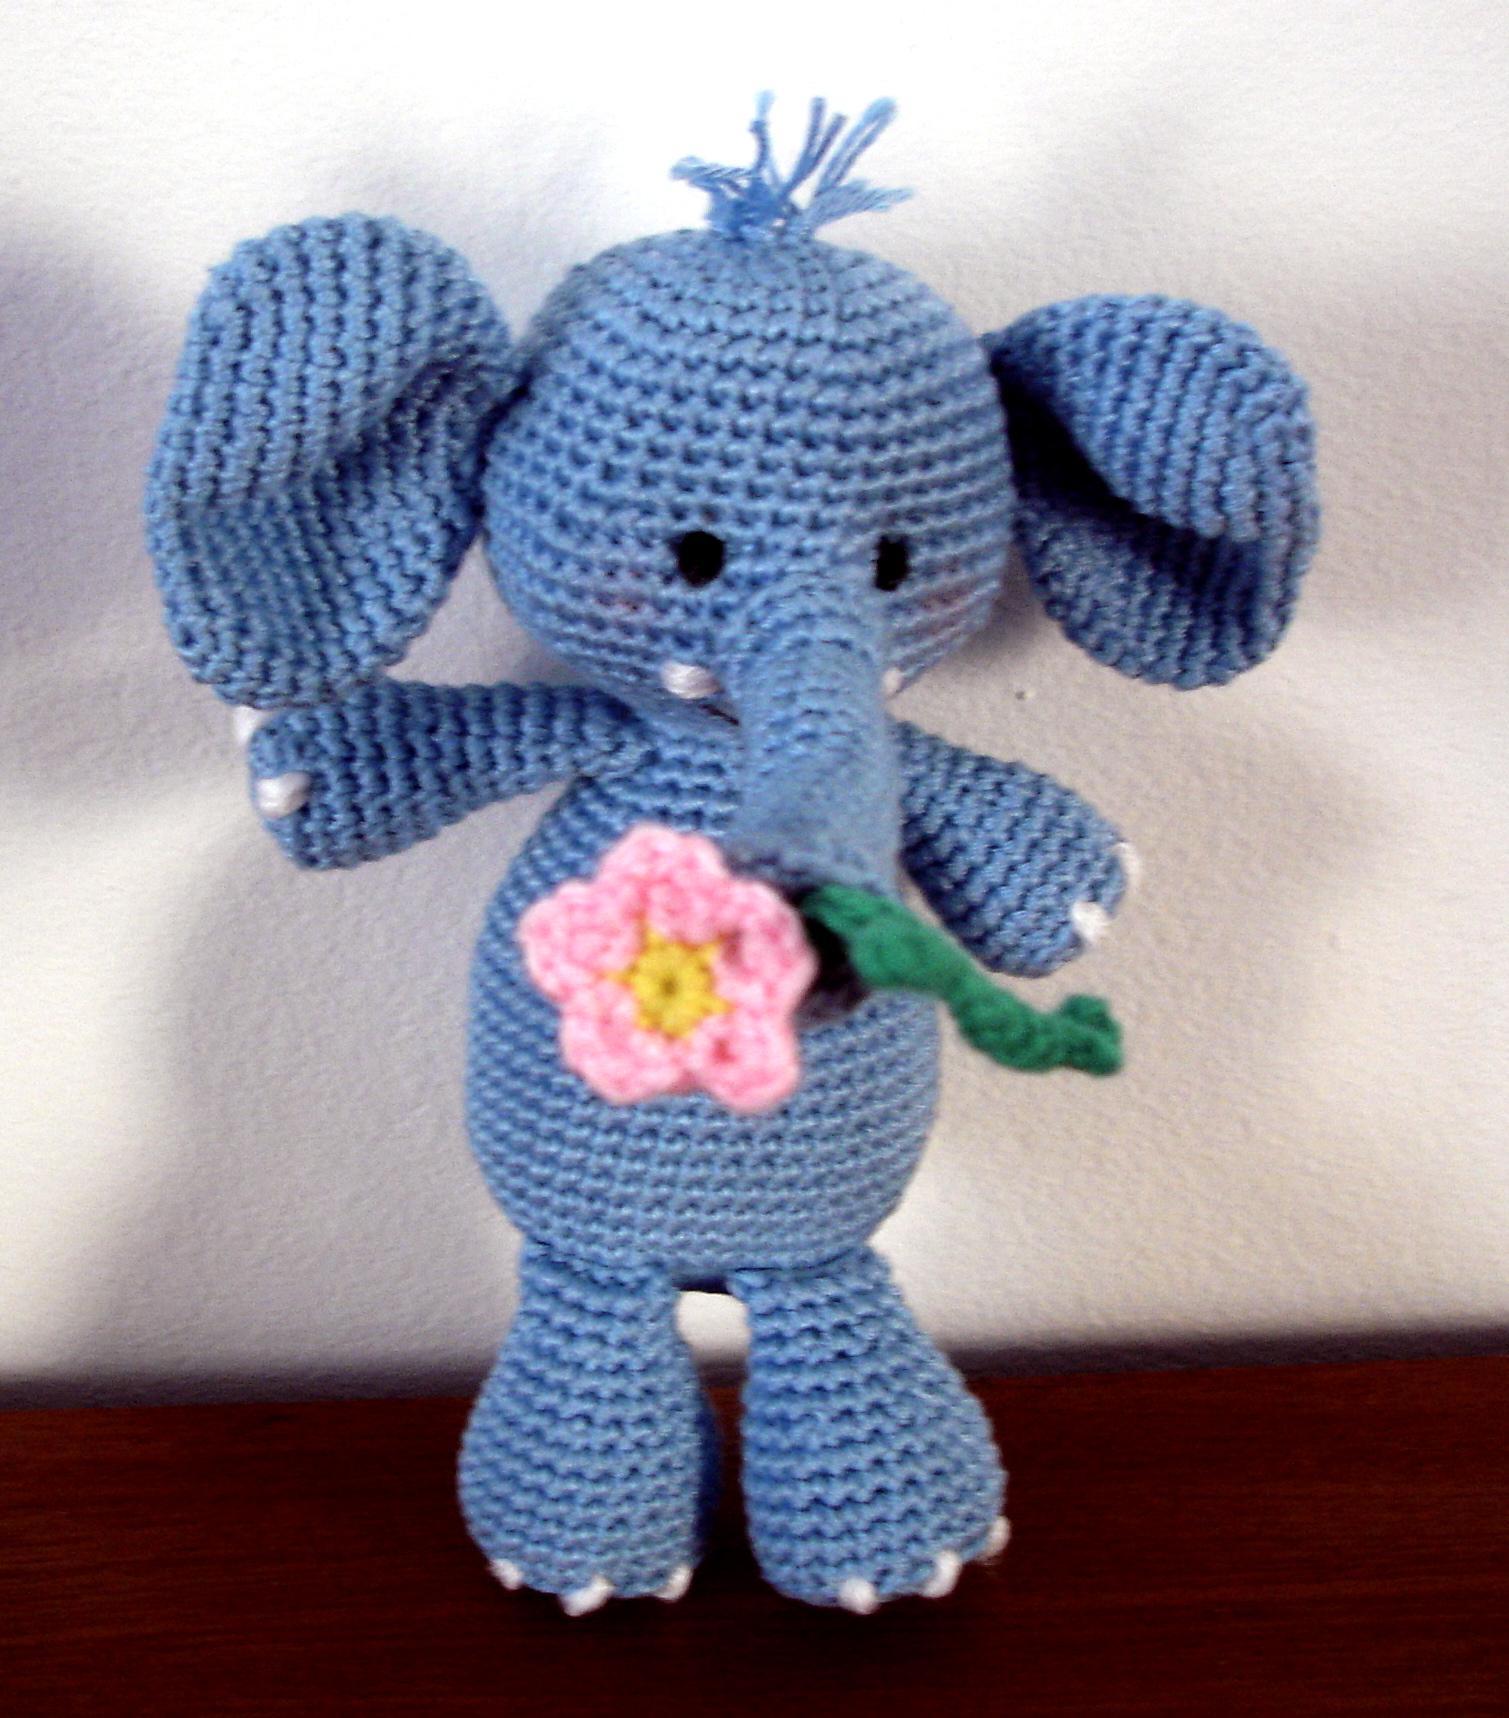 Free Circus Elephant & Ball Crochet Pattern by Amour Fou | Crochet ... | 1718x1509